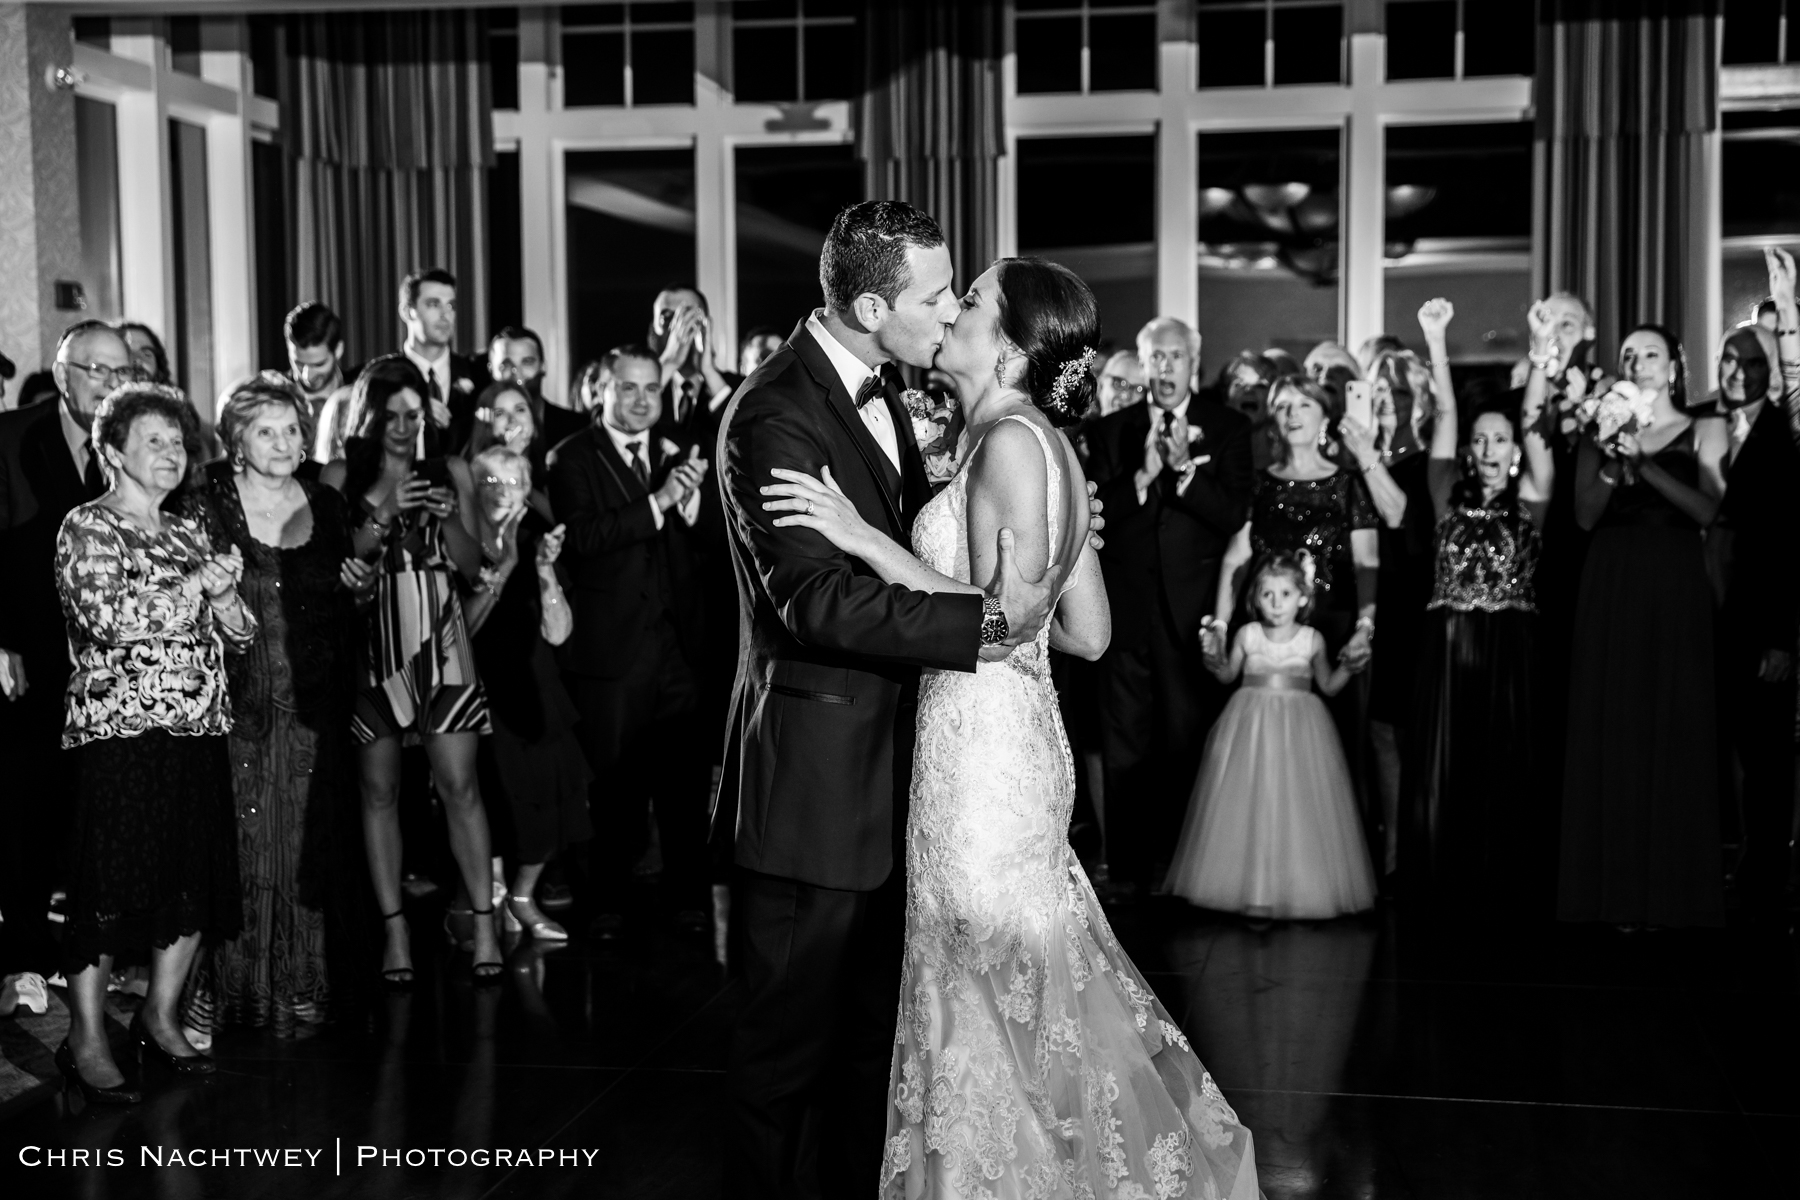 wedding-lake-of-isles-photos-chris-nachtwey-photography-2019-50.jpg